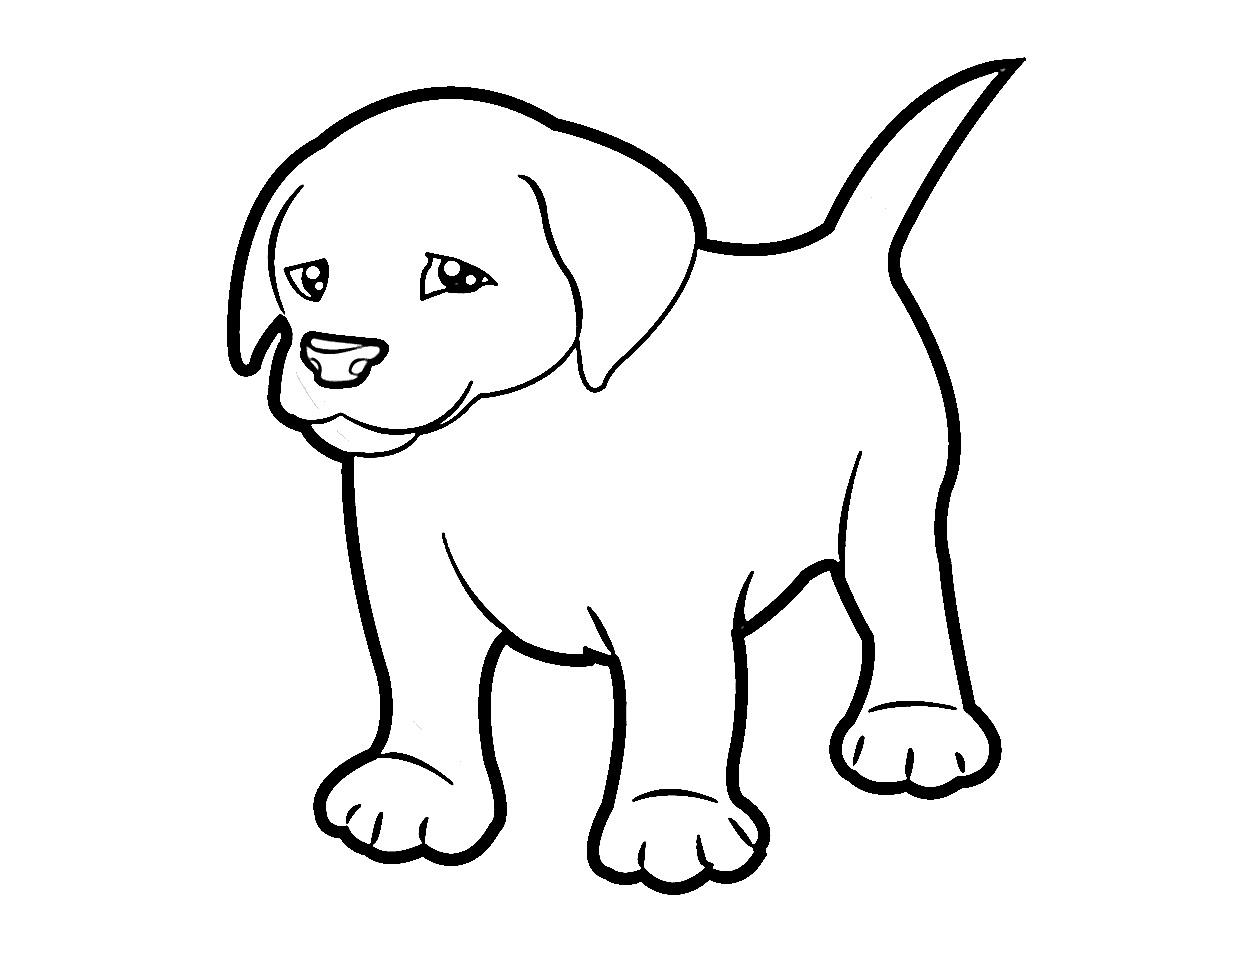 Hunde Ausmalbilder – Lieblingstier Malvorlagen → DieMalen.com